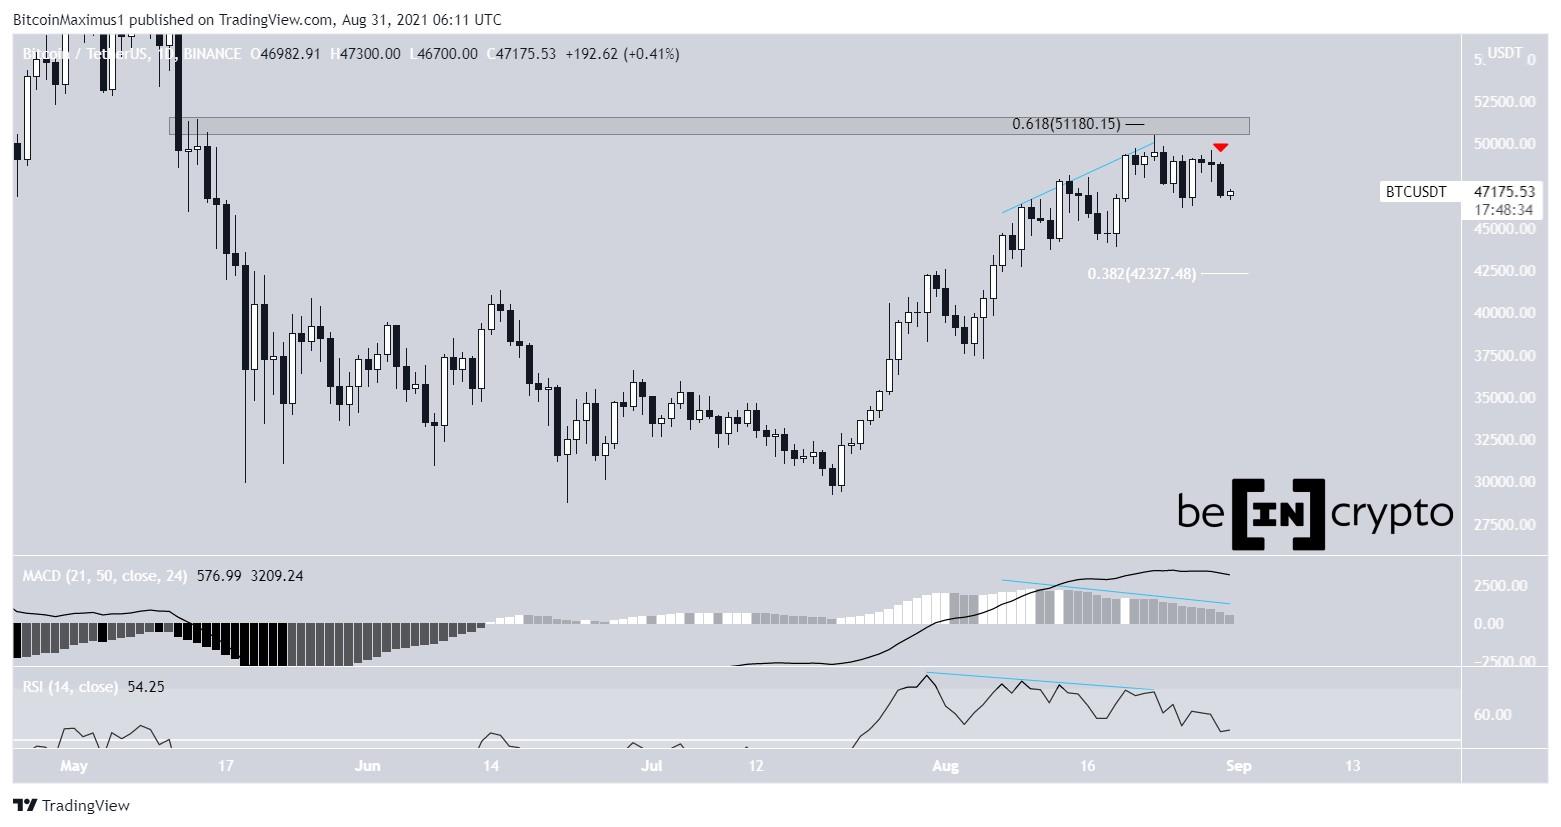 Bitcoin price course BTC chart 08/31/2021